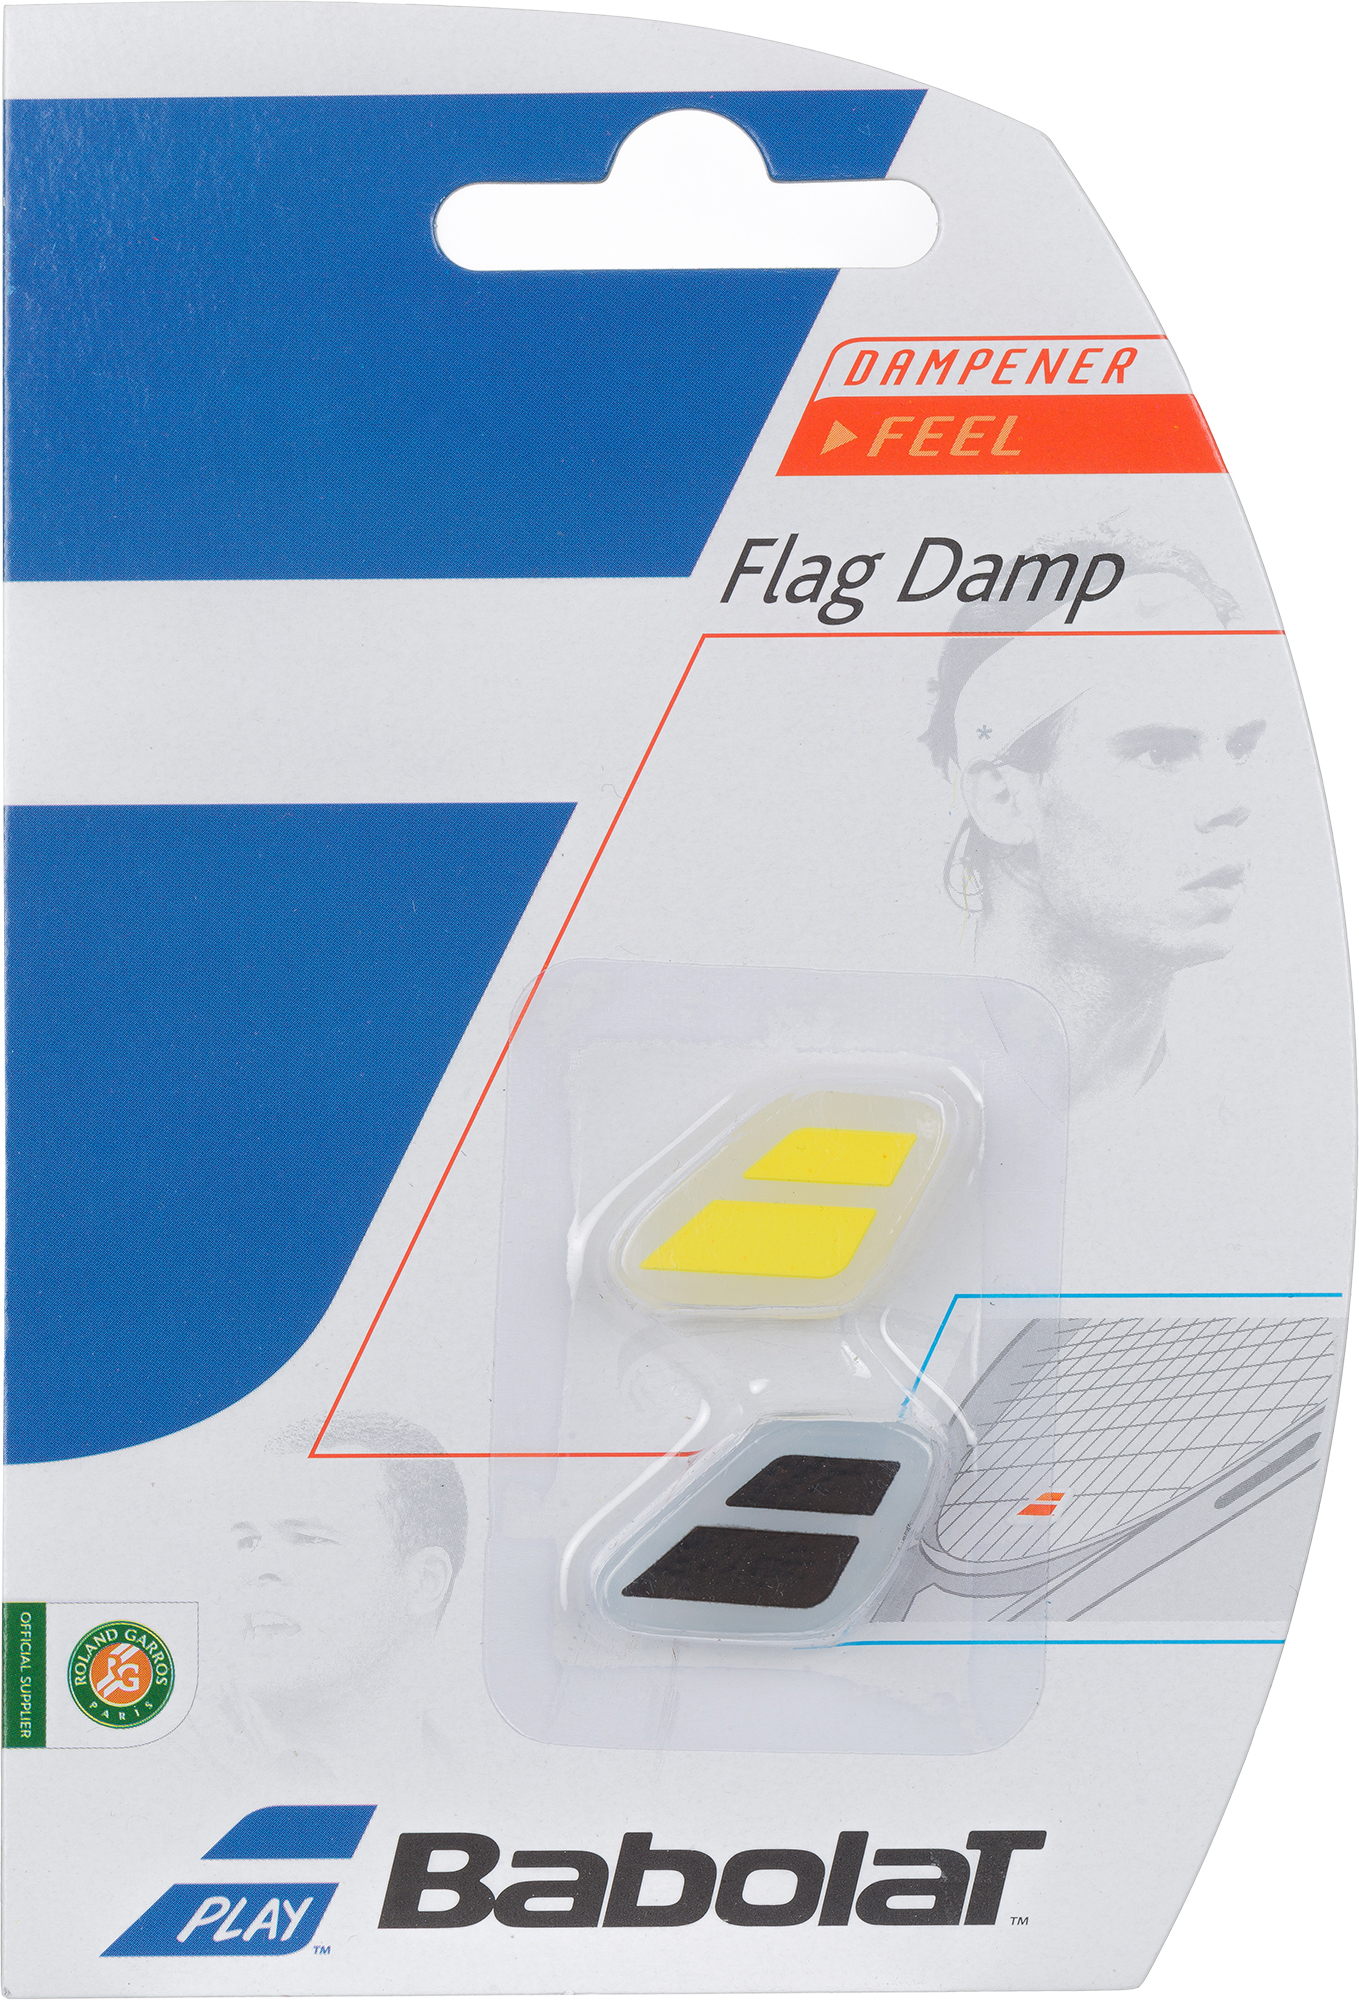 Babolat Виброгаситель Babolat Flag Damp X2, размер Без размера babolat футболка мужская babolat perf crew neck tee размер 50